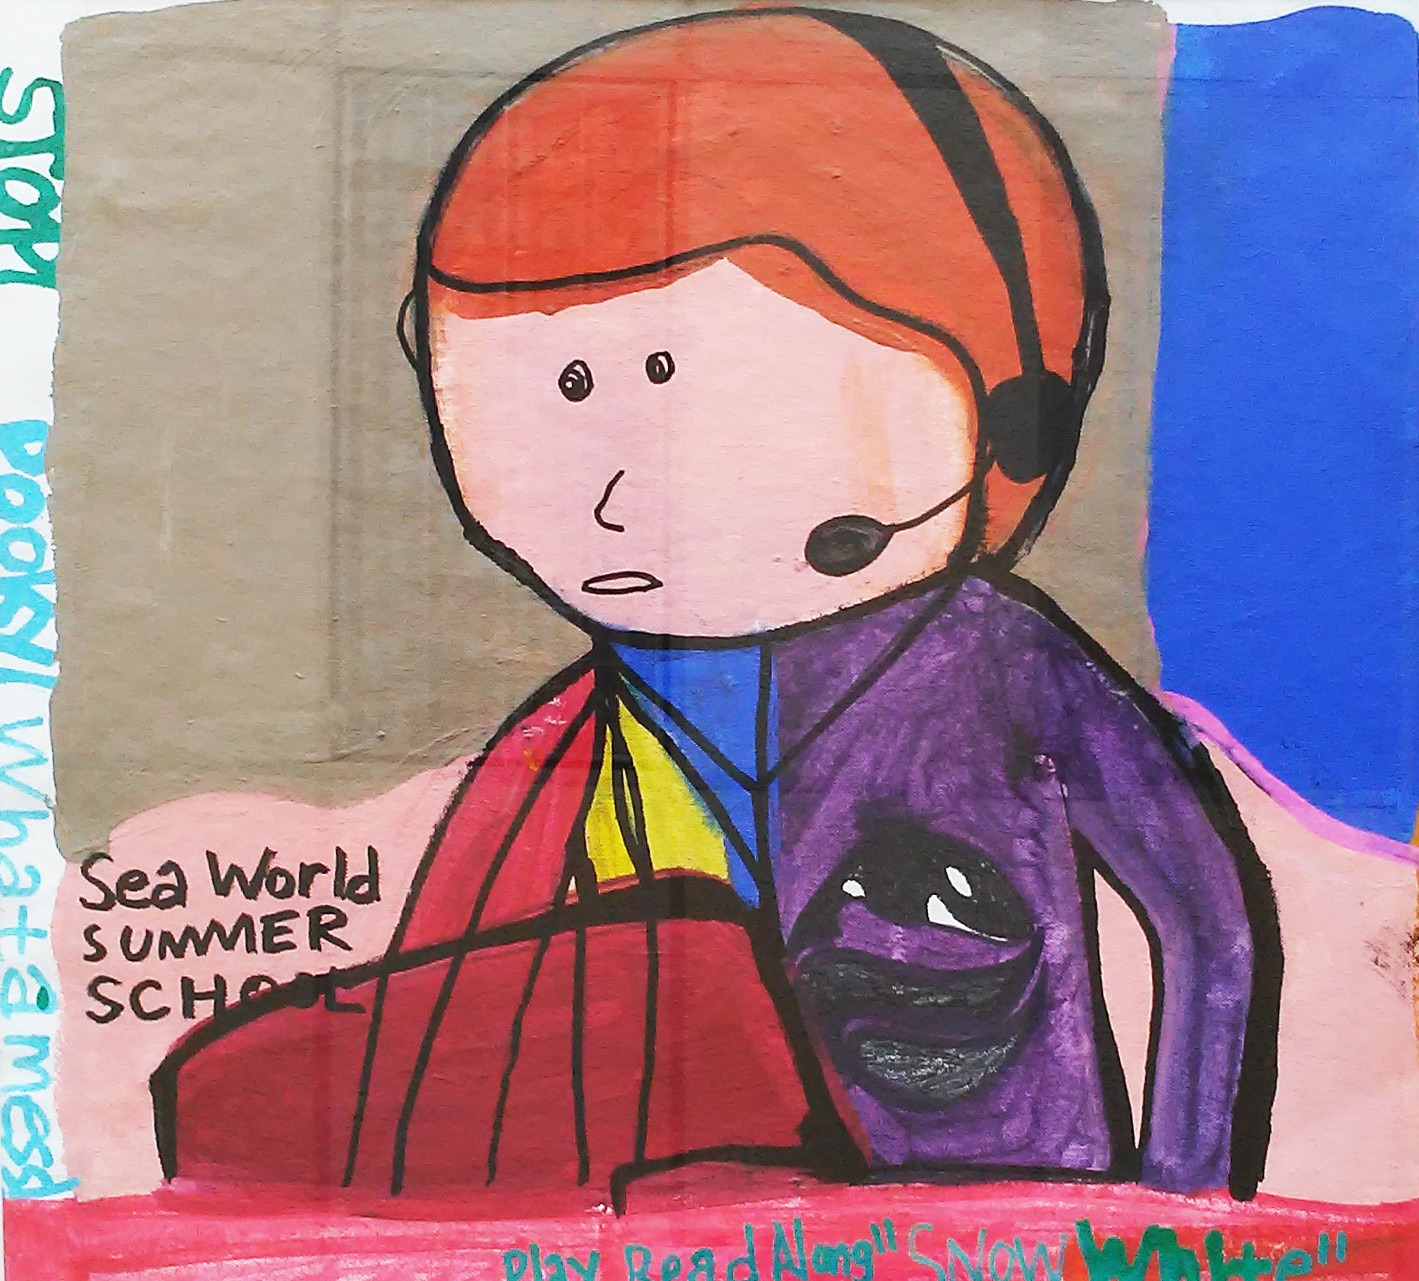 Sea World Summer School